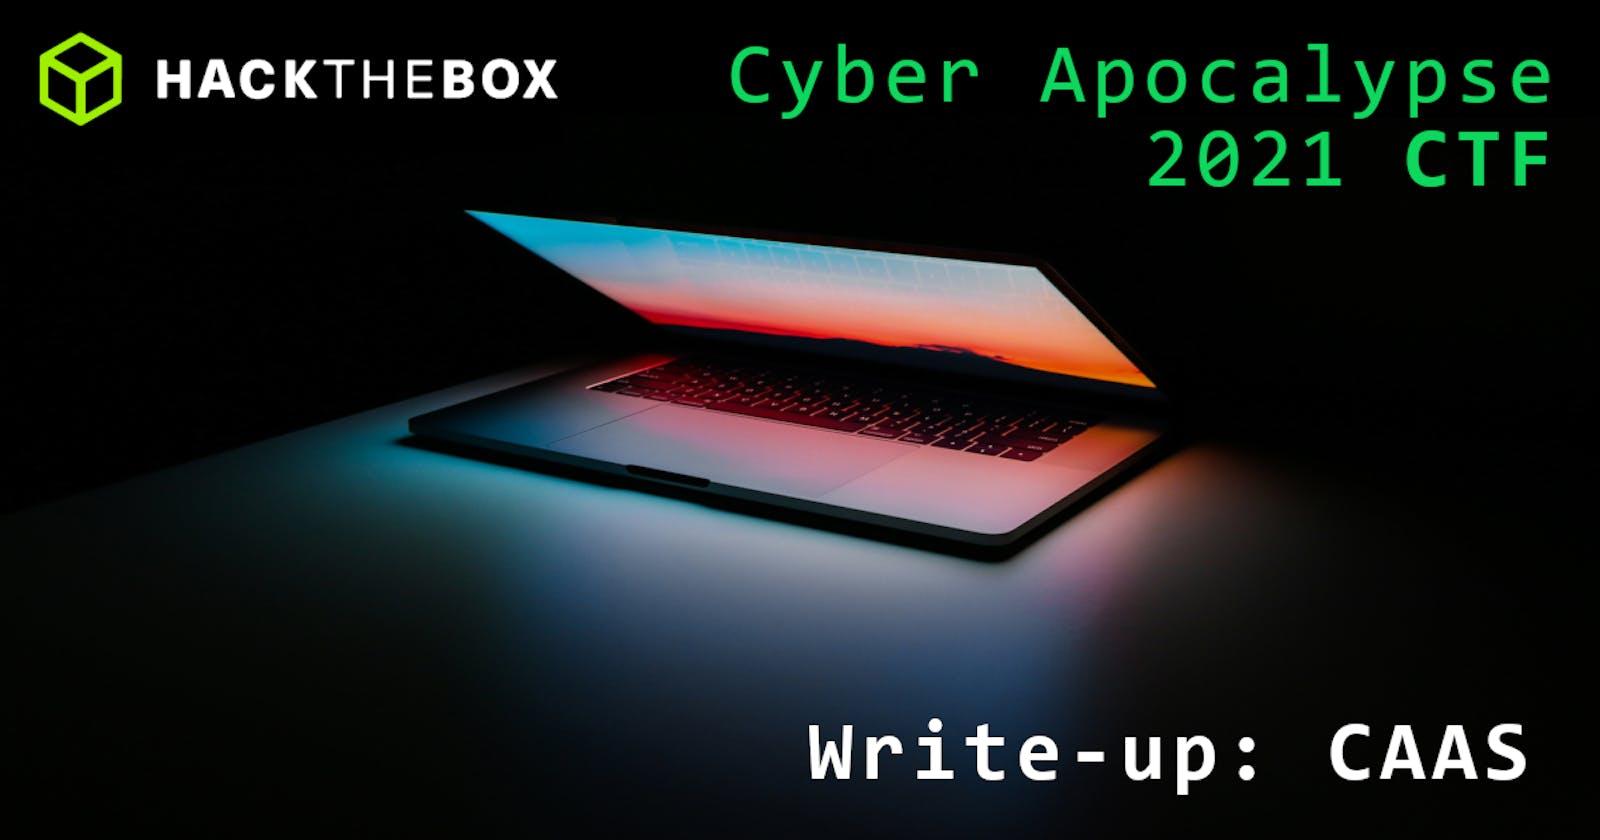 Cyber Apocalypse 2021: CAAS